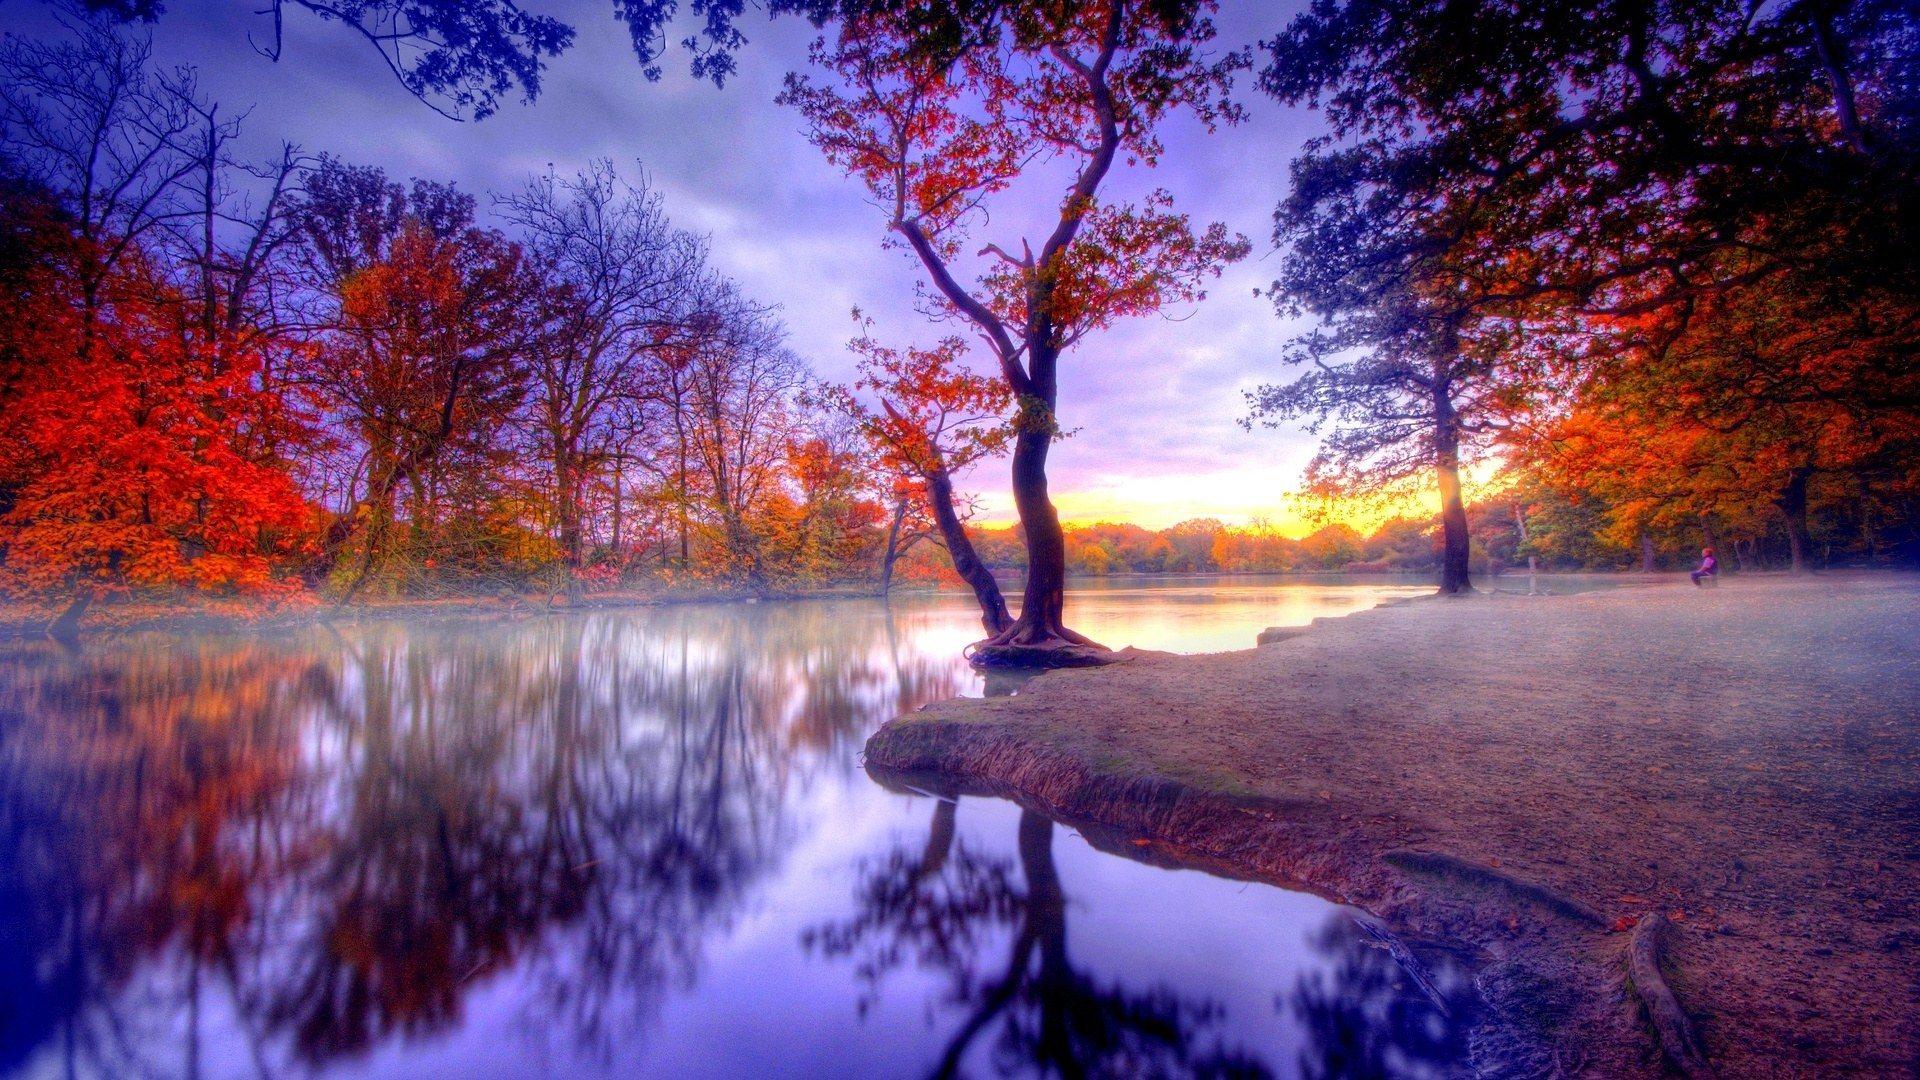 Autumn Landscape   Full HD Desktop Wallpapers 1080p